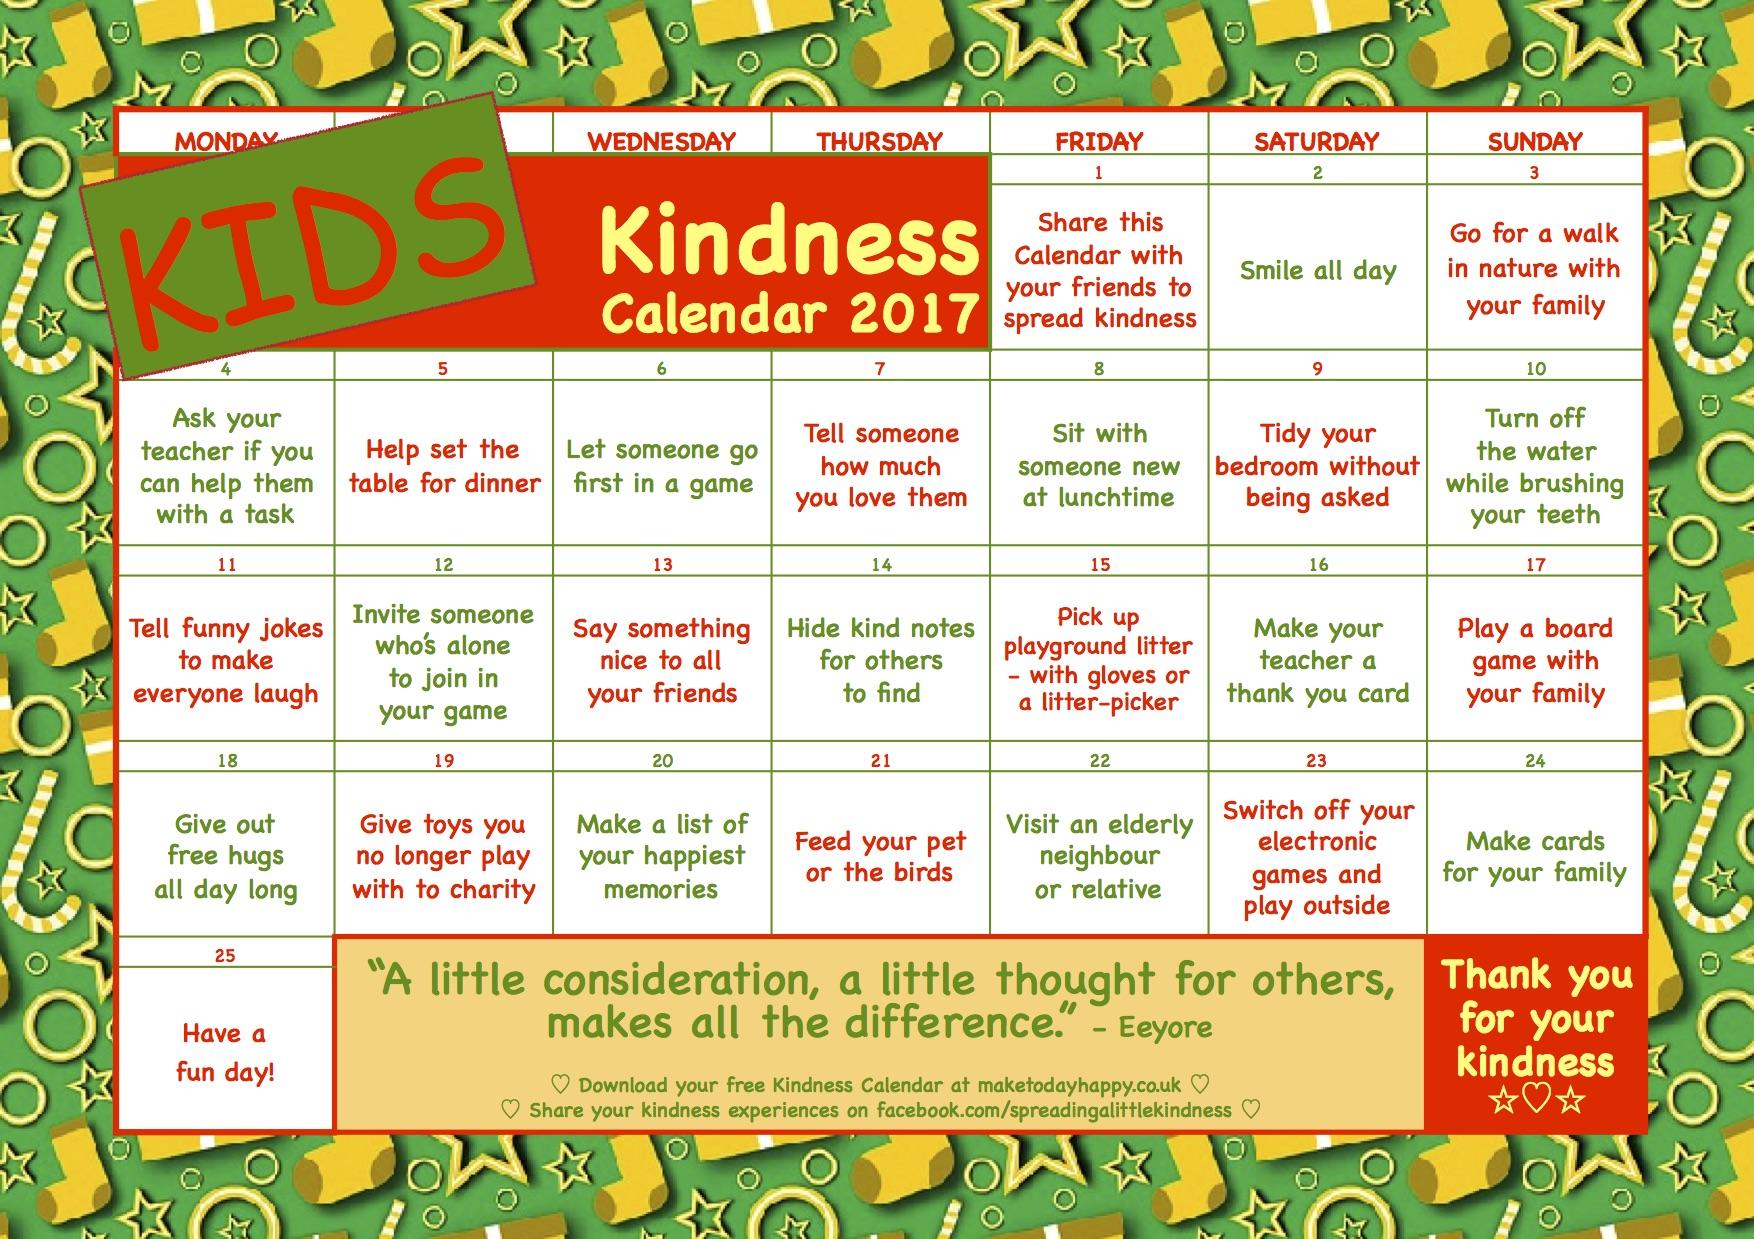 KIDS Kindness Calendar 2017 GENERIC.jpg